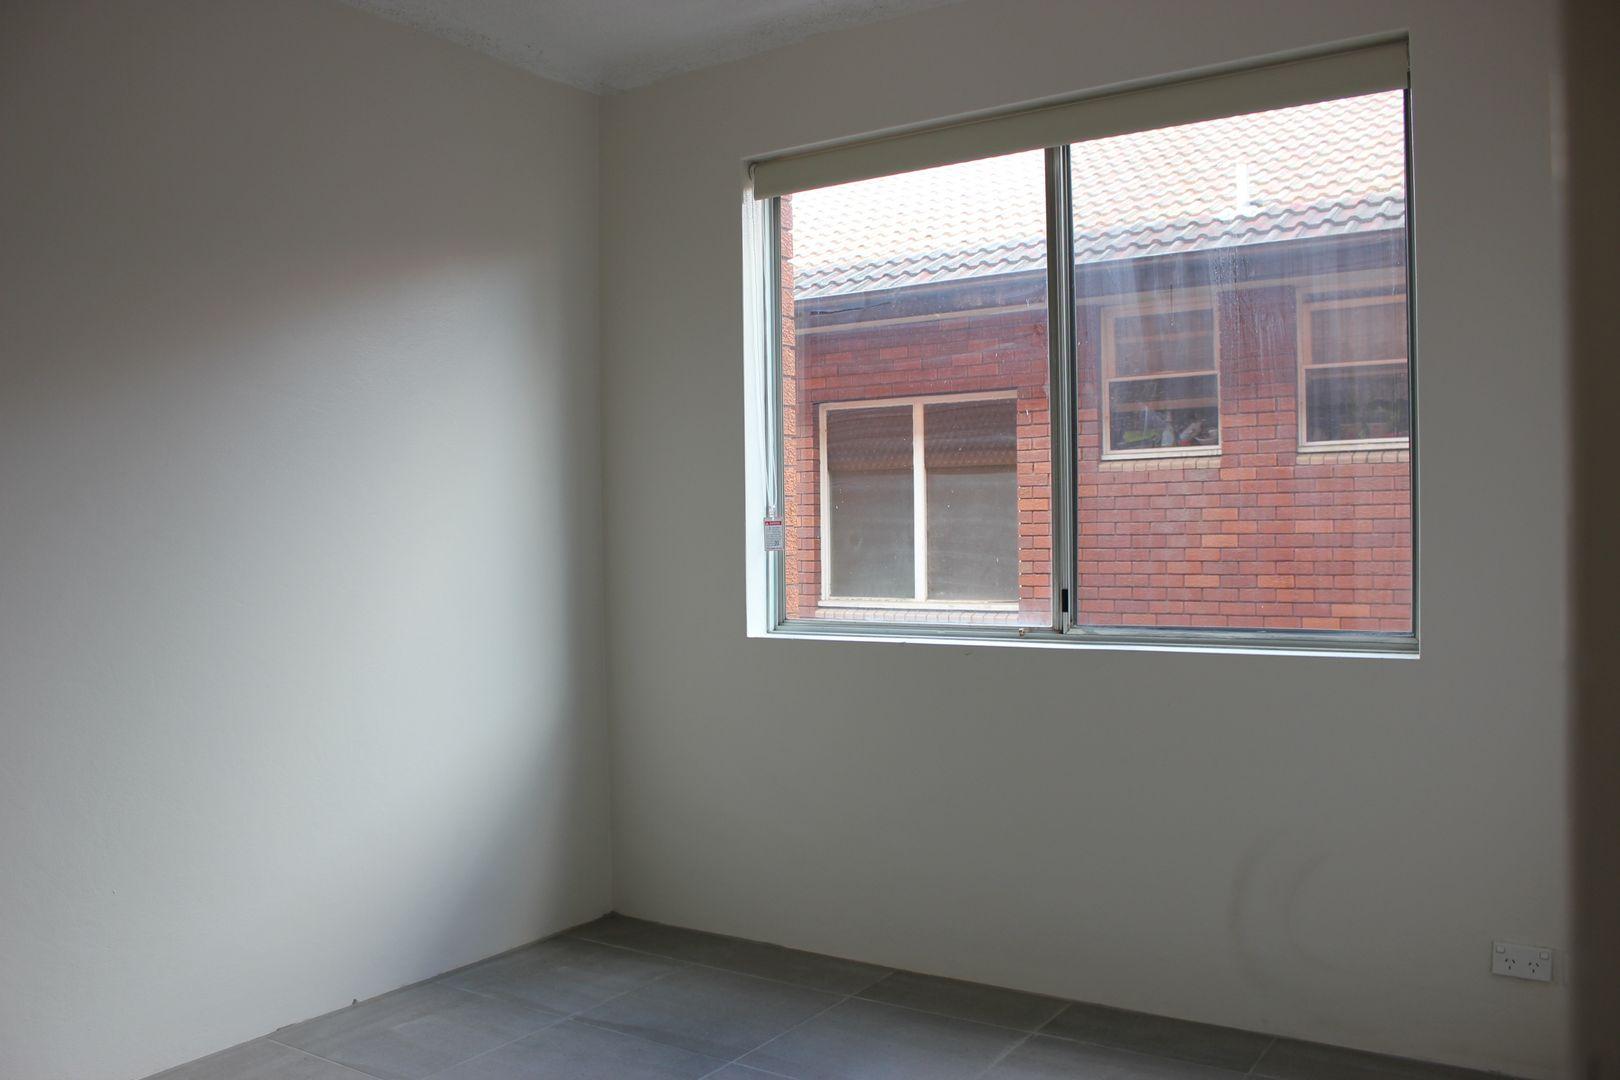 4/144 Longfield Street, Cabramatta NSW 2166, Image 1